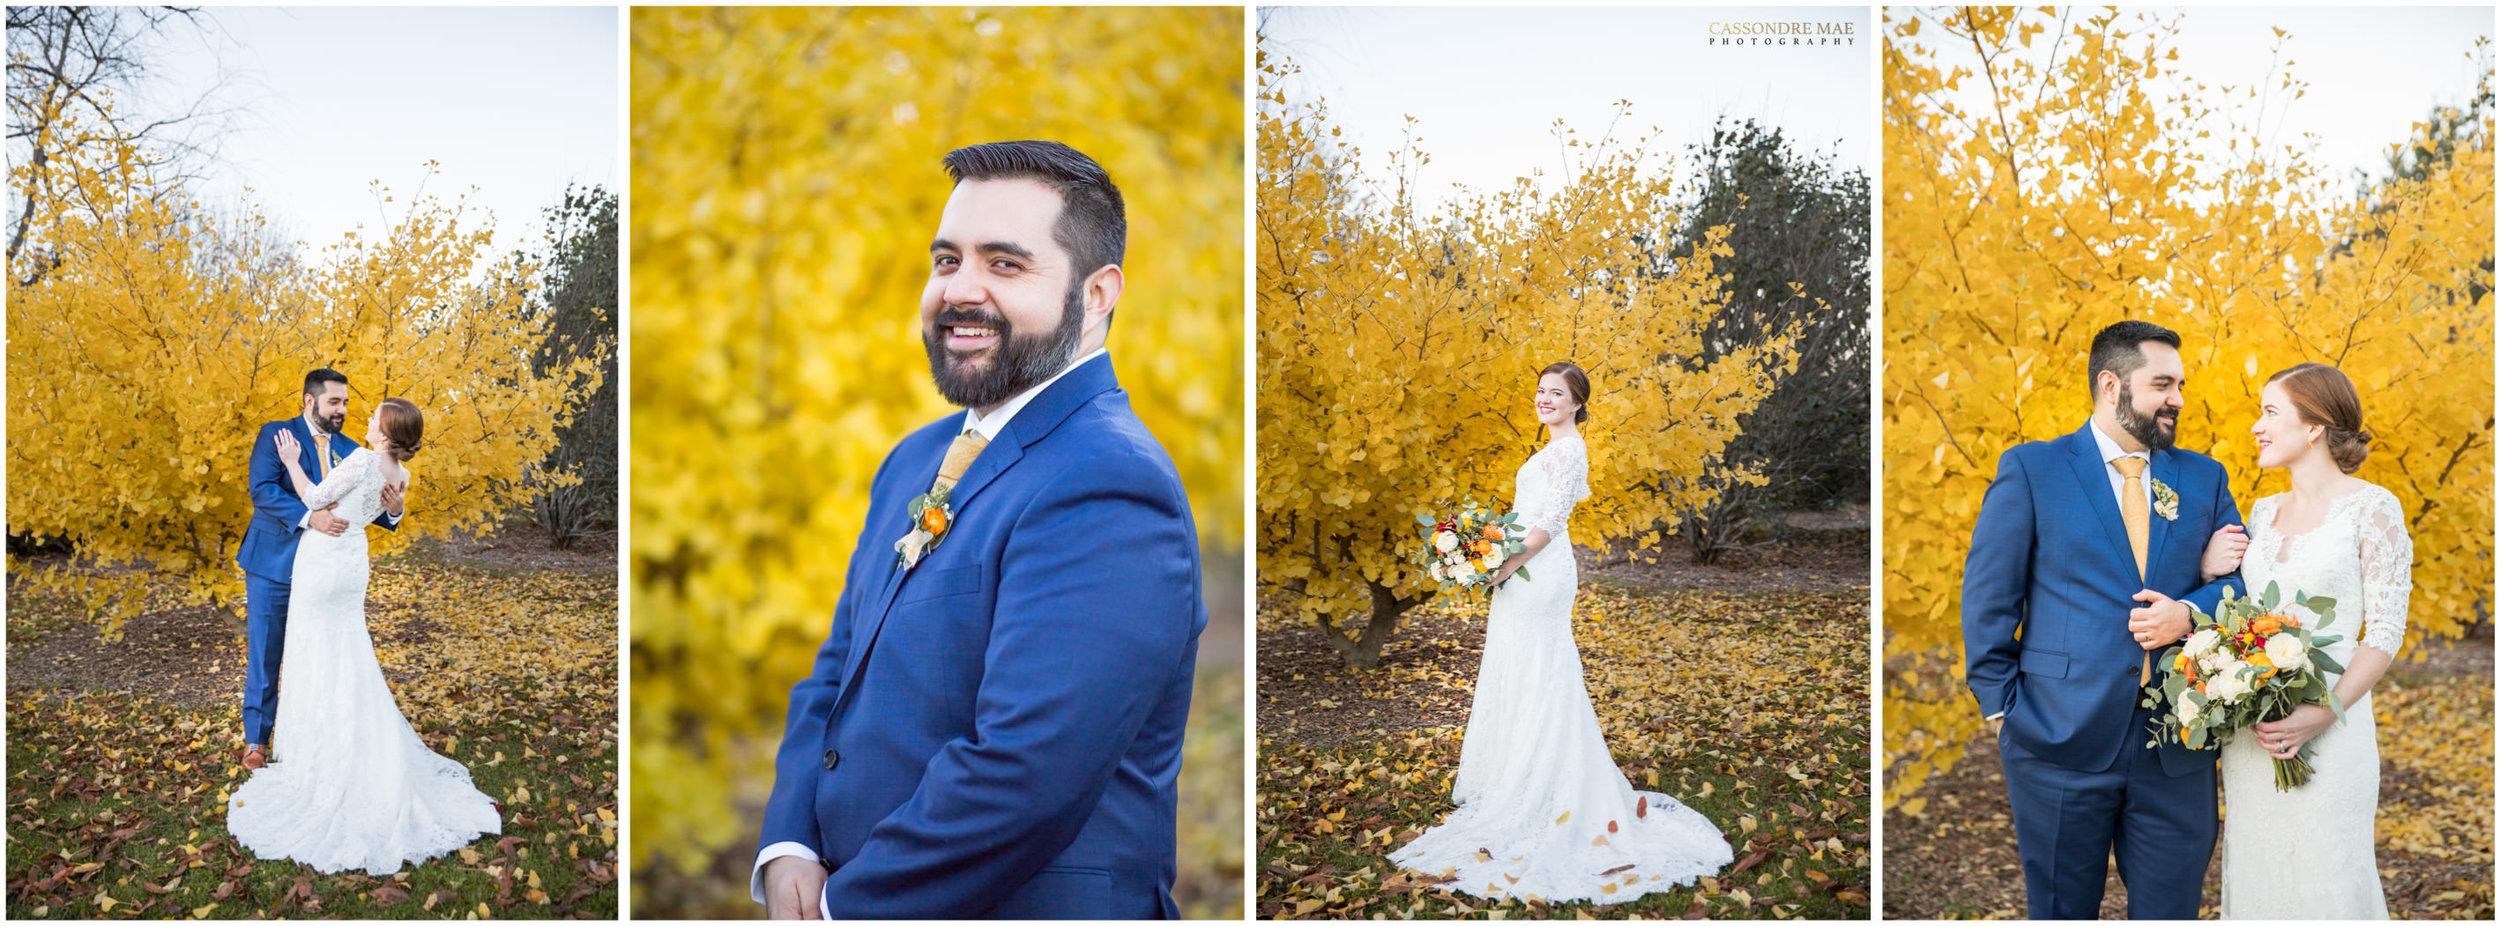 Cassondre Mae Photography Stony Ford Wedding 12.jpg